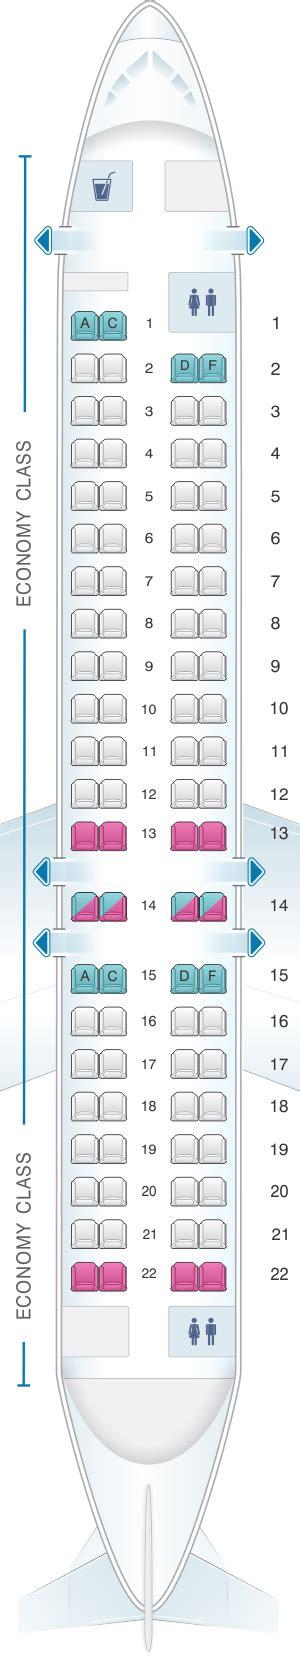 canadair regional jet seating seat map adria airways bombardier crj 900 seatmaestro